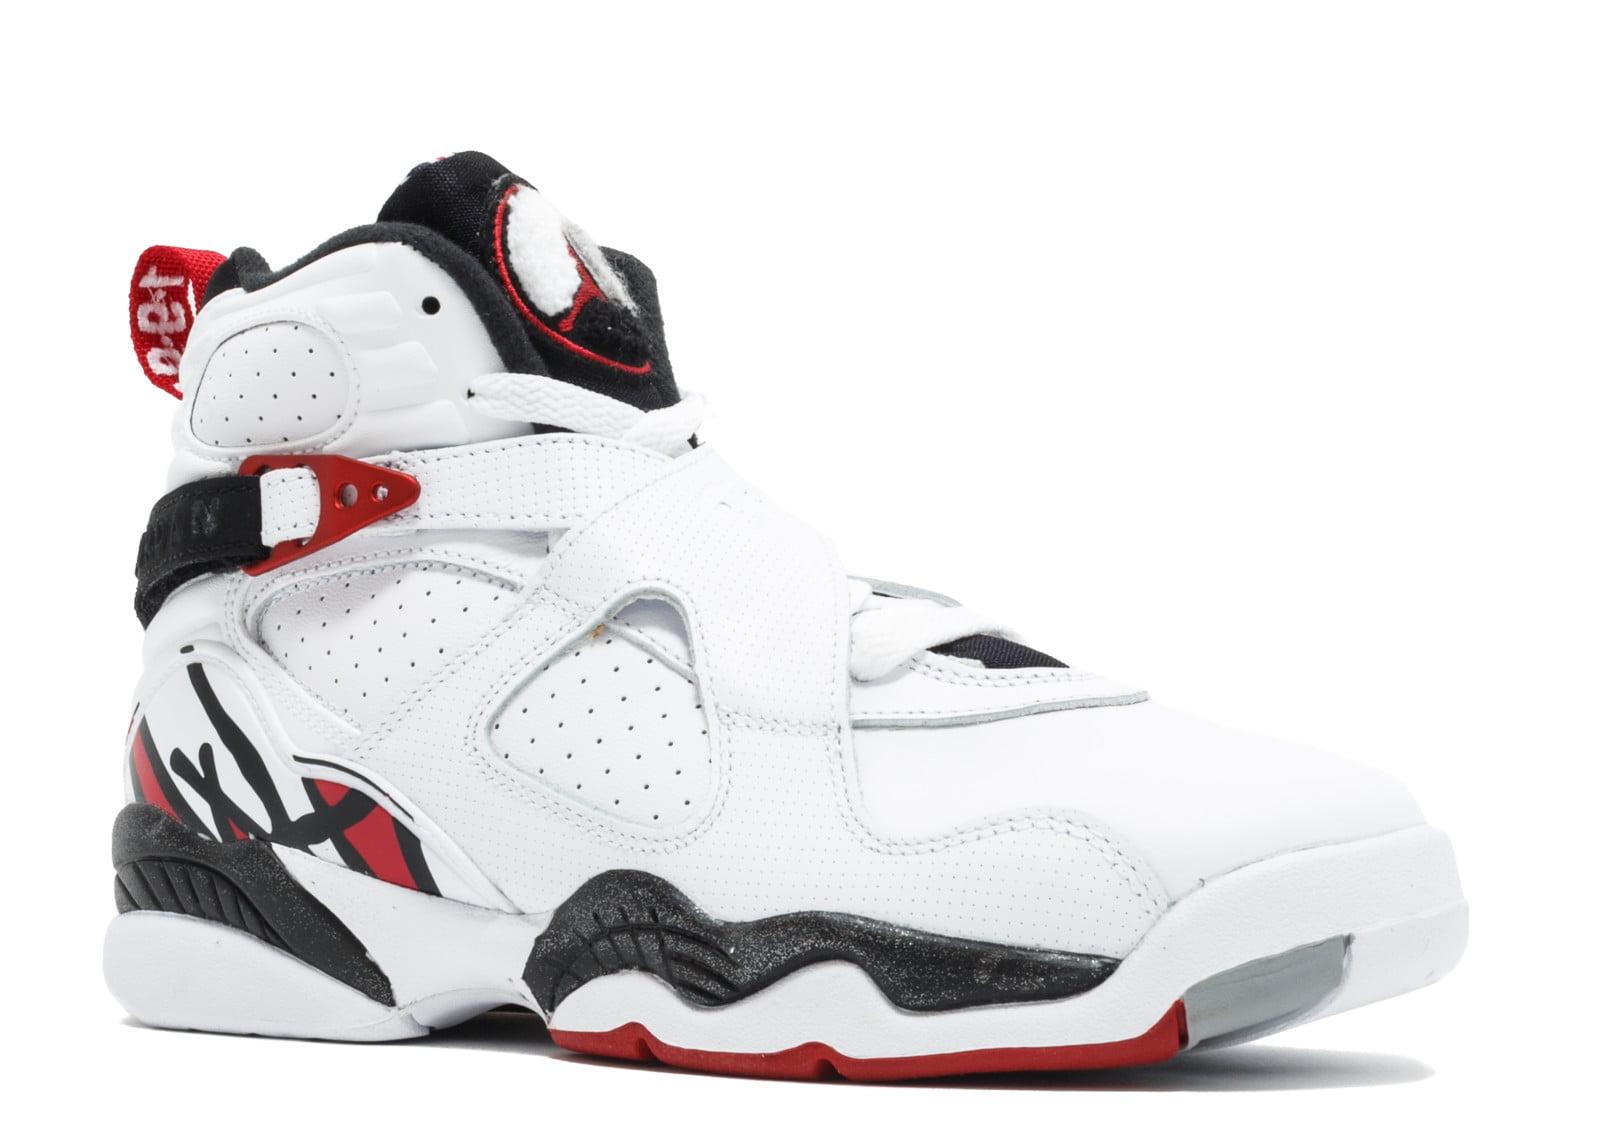 a3ba1b9474c6d0 Sneakers   Running Shoes